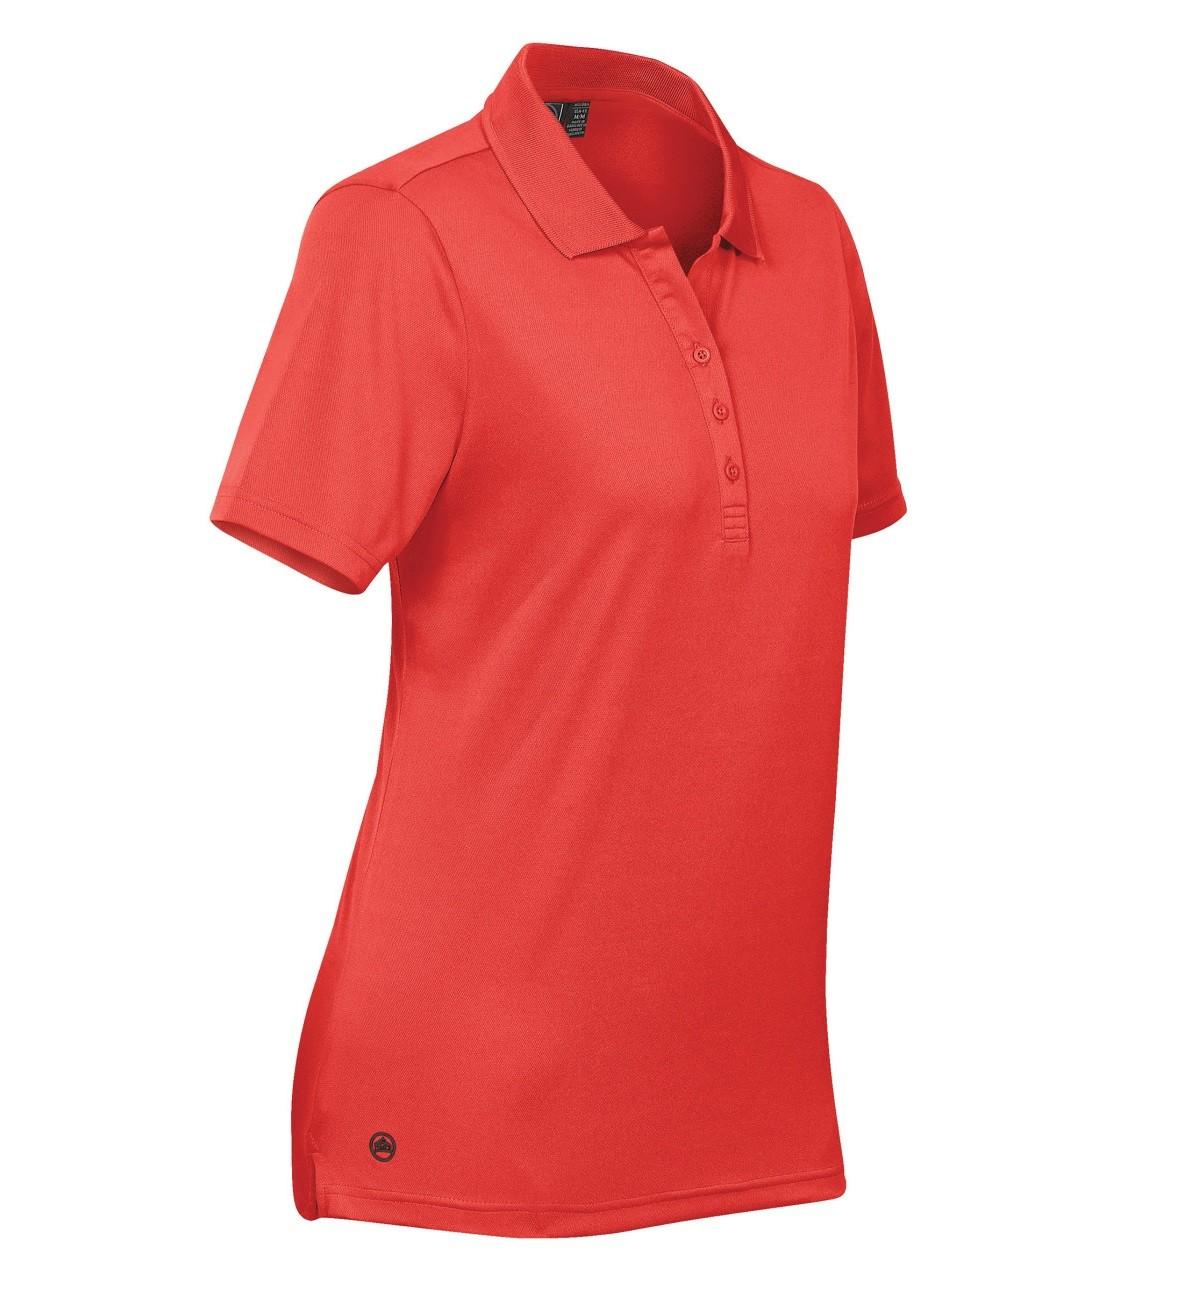 7178c432057c Personalised, Custom, & Printed Womens Polo Shirts   Banana Moon